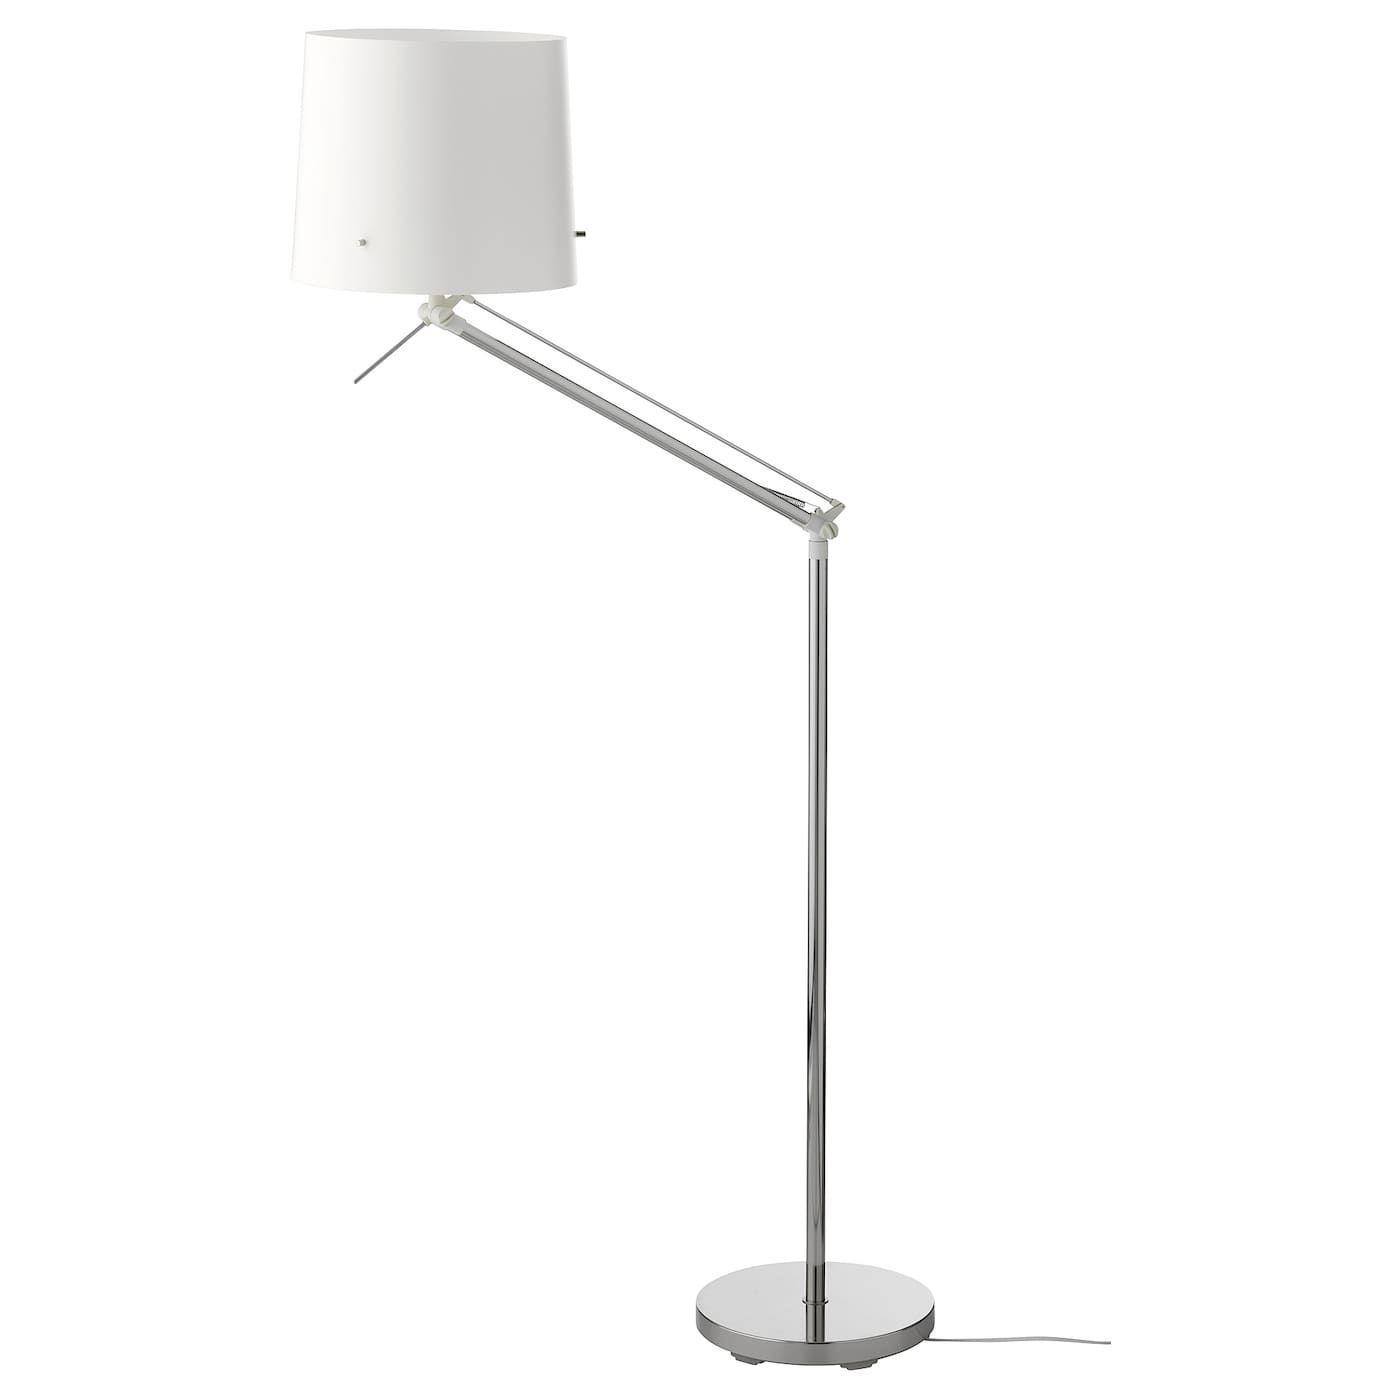 Stehlampe Ikea Grau